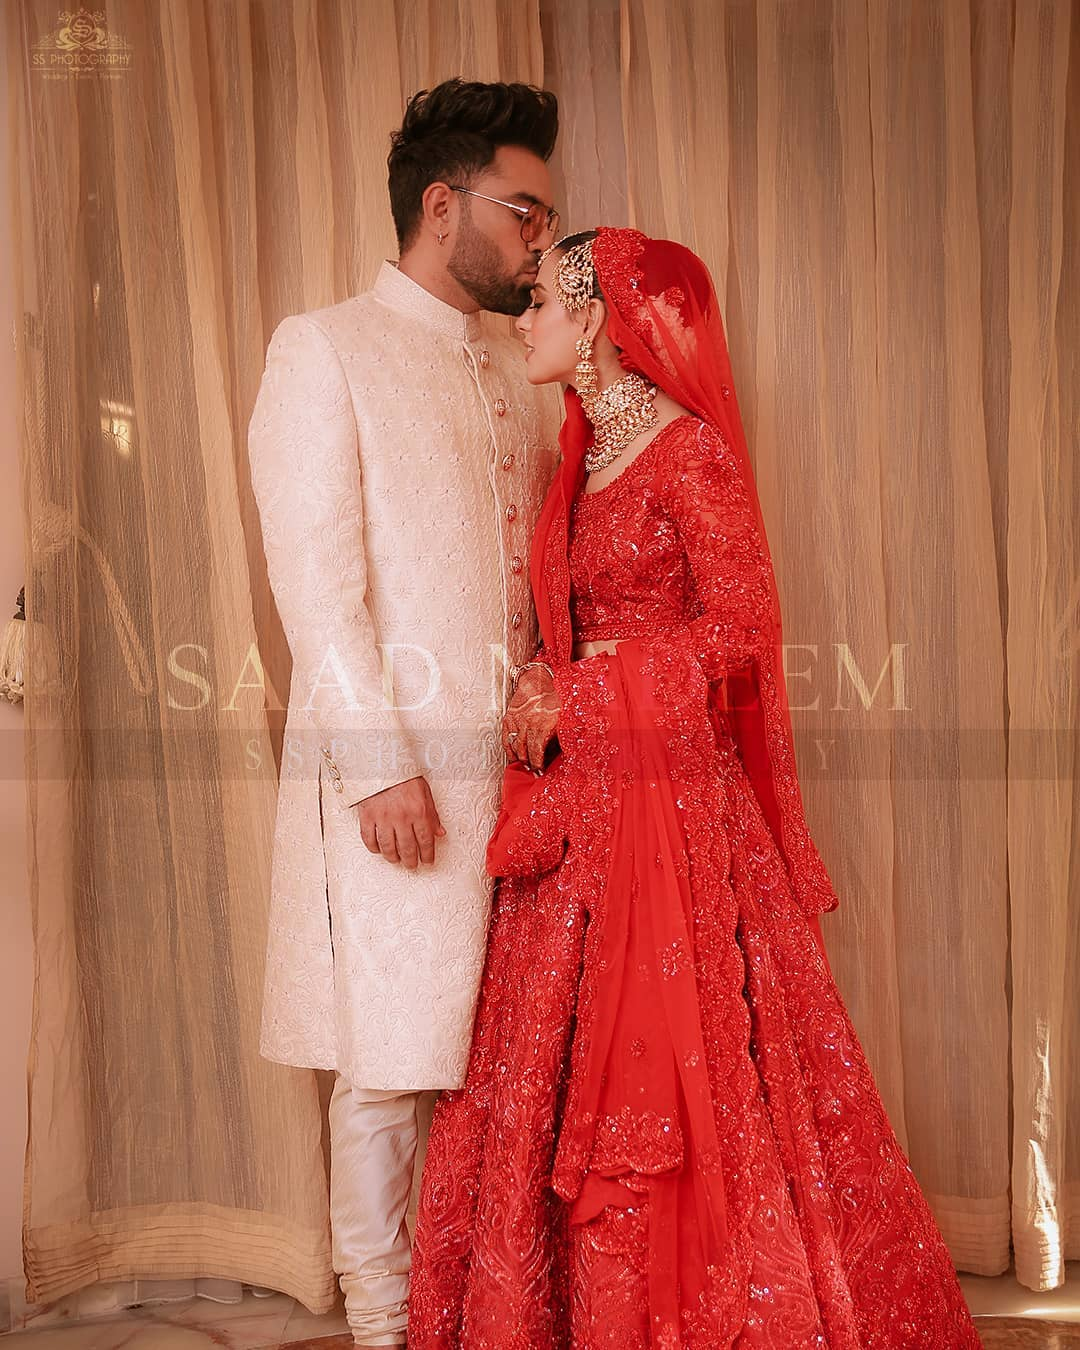 Iqra Aziz and Yasir Hussain Wedding Pictures (26)